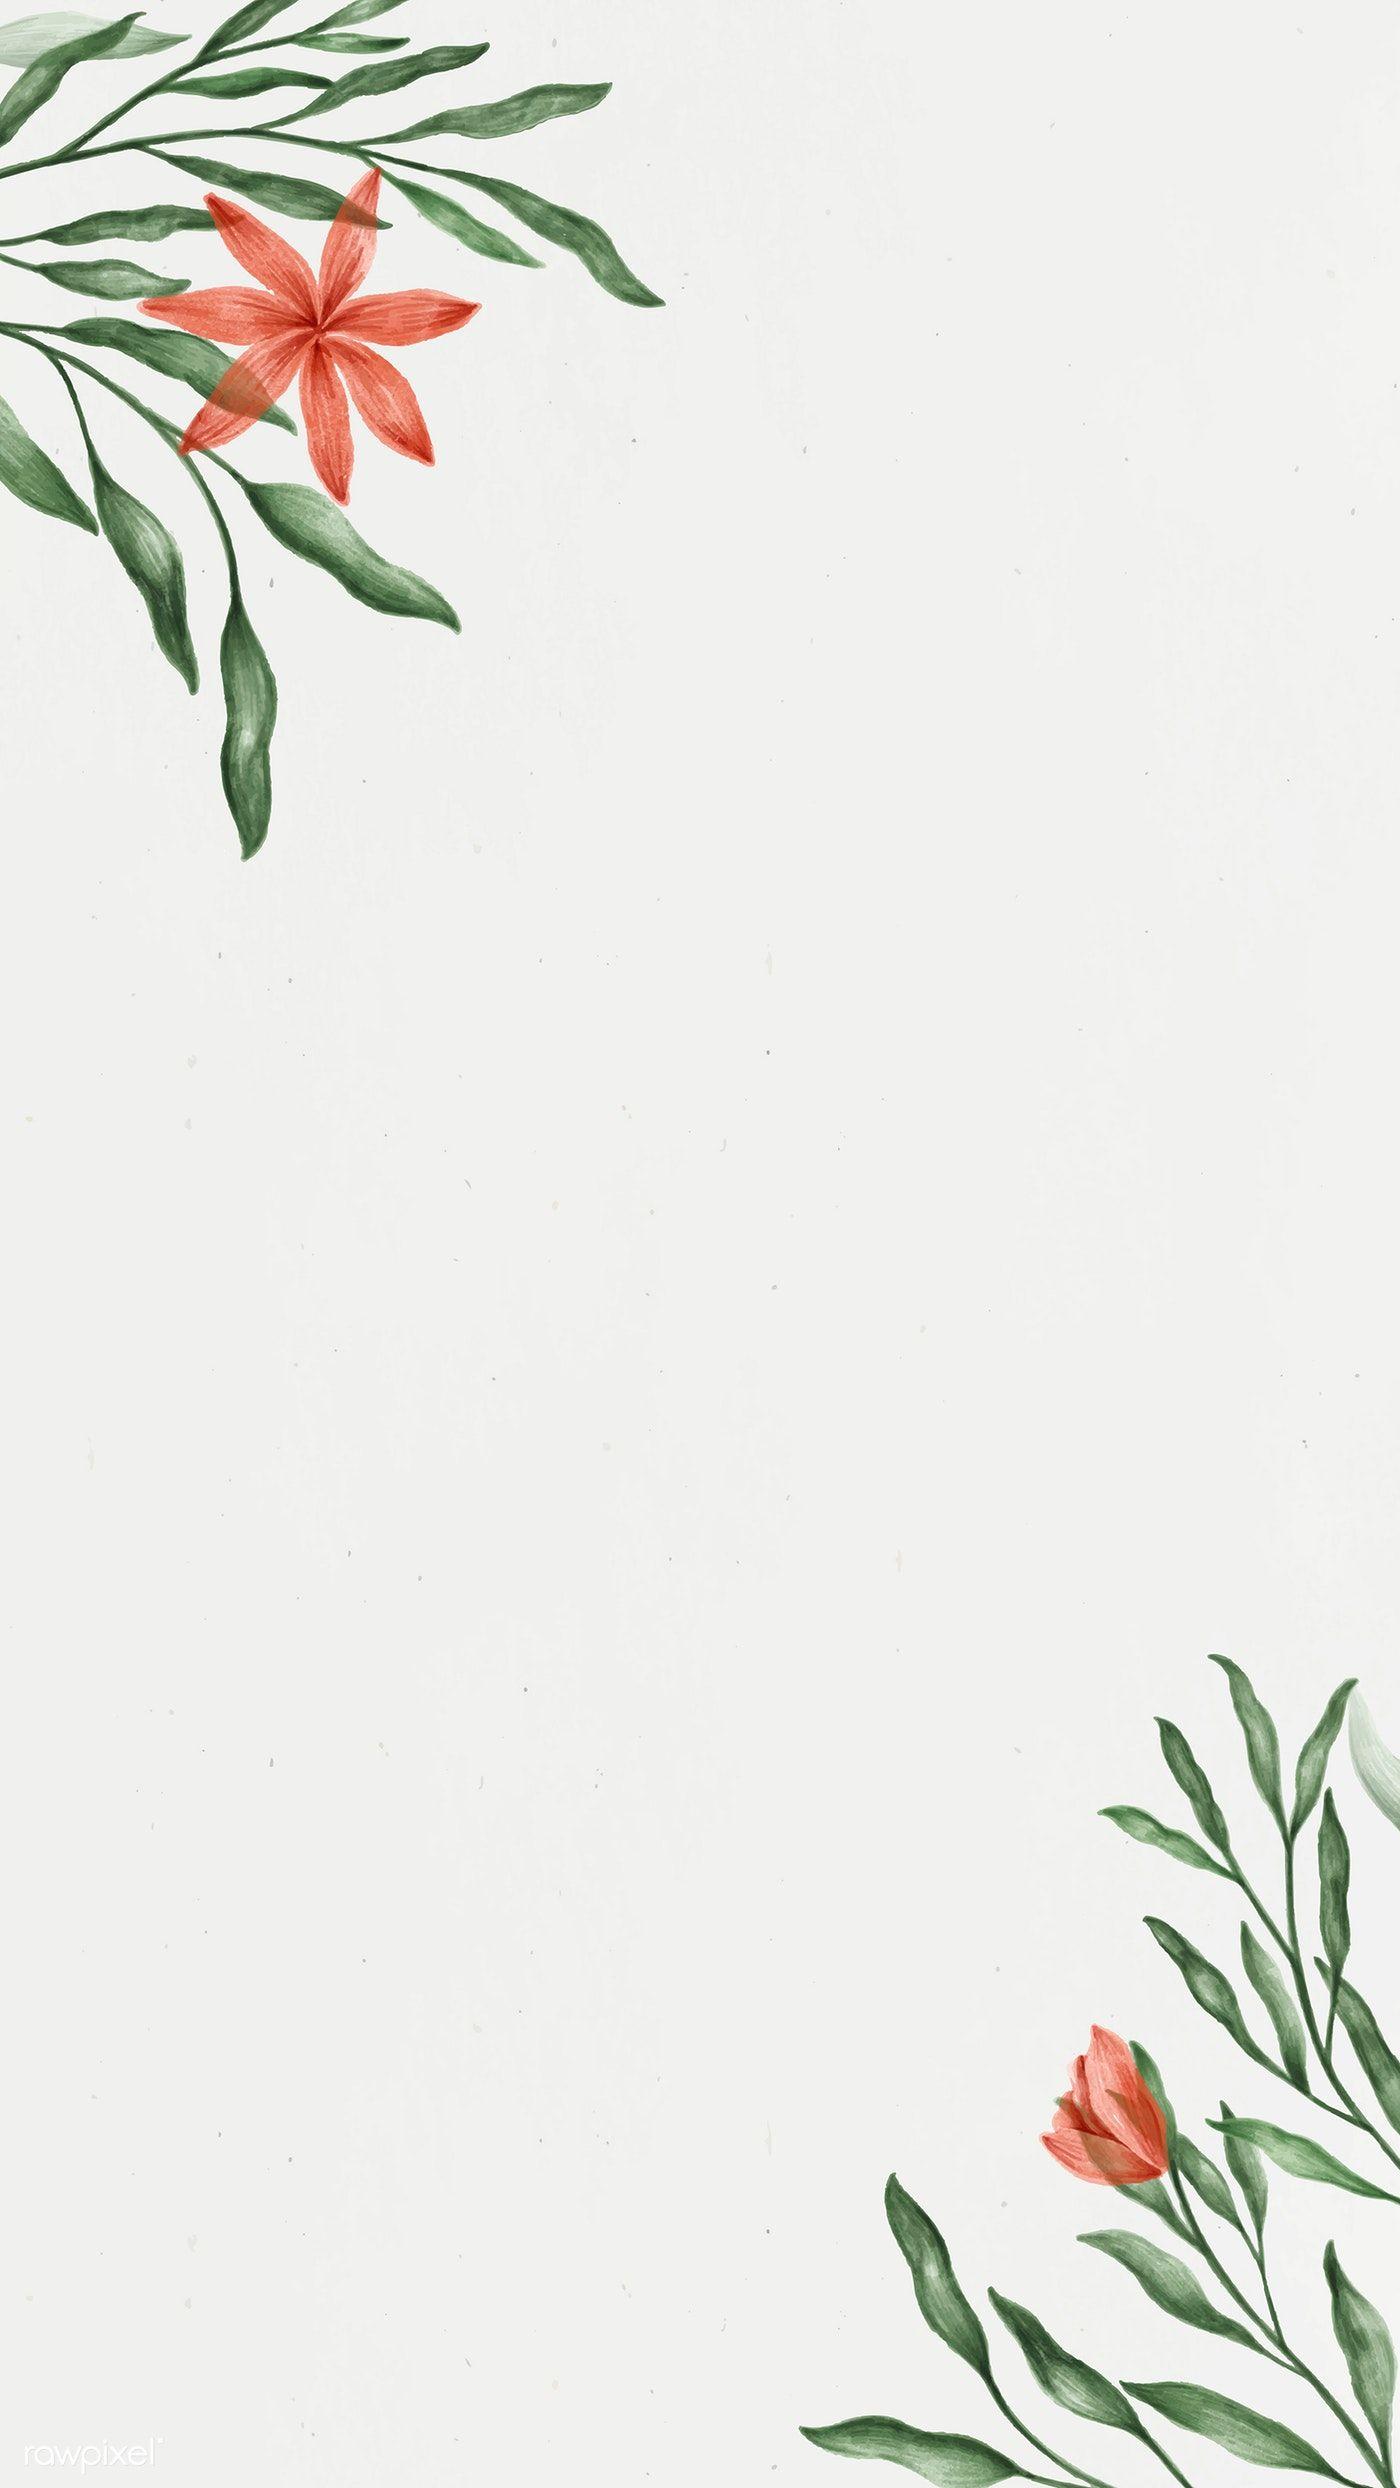 Download Premium Vector Of Floral Frame Design Mobile Phone Wallpaper In 2021 Floral Poster Plain Wallpaper Iphone Flower Illustration